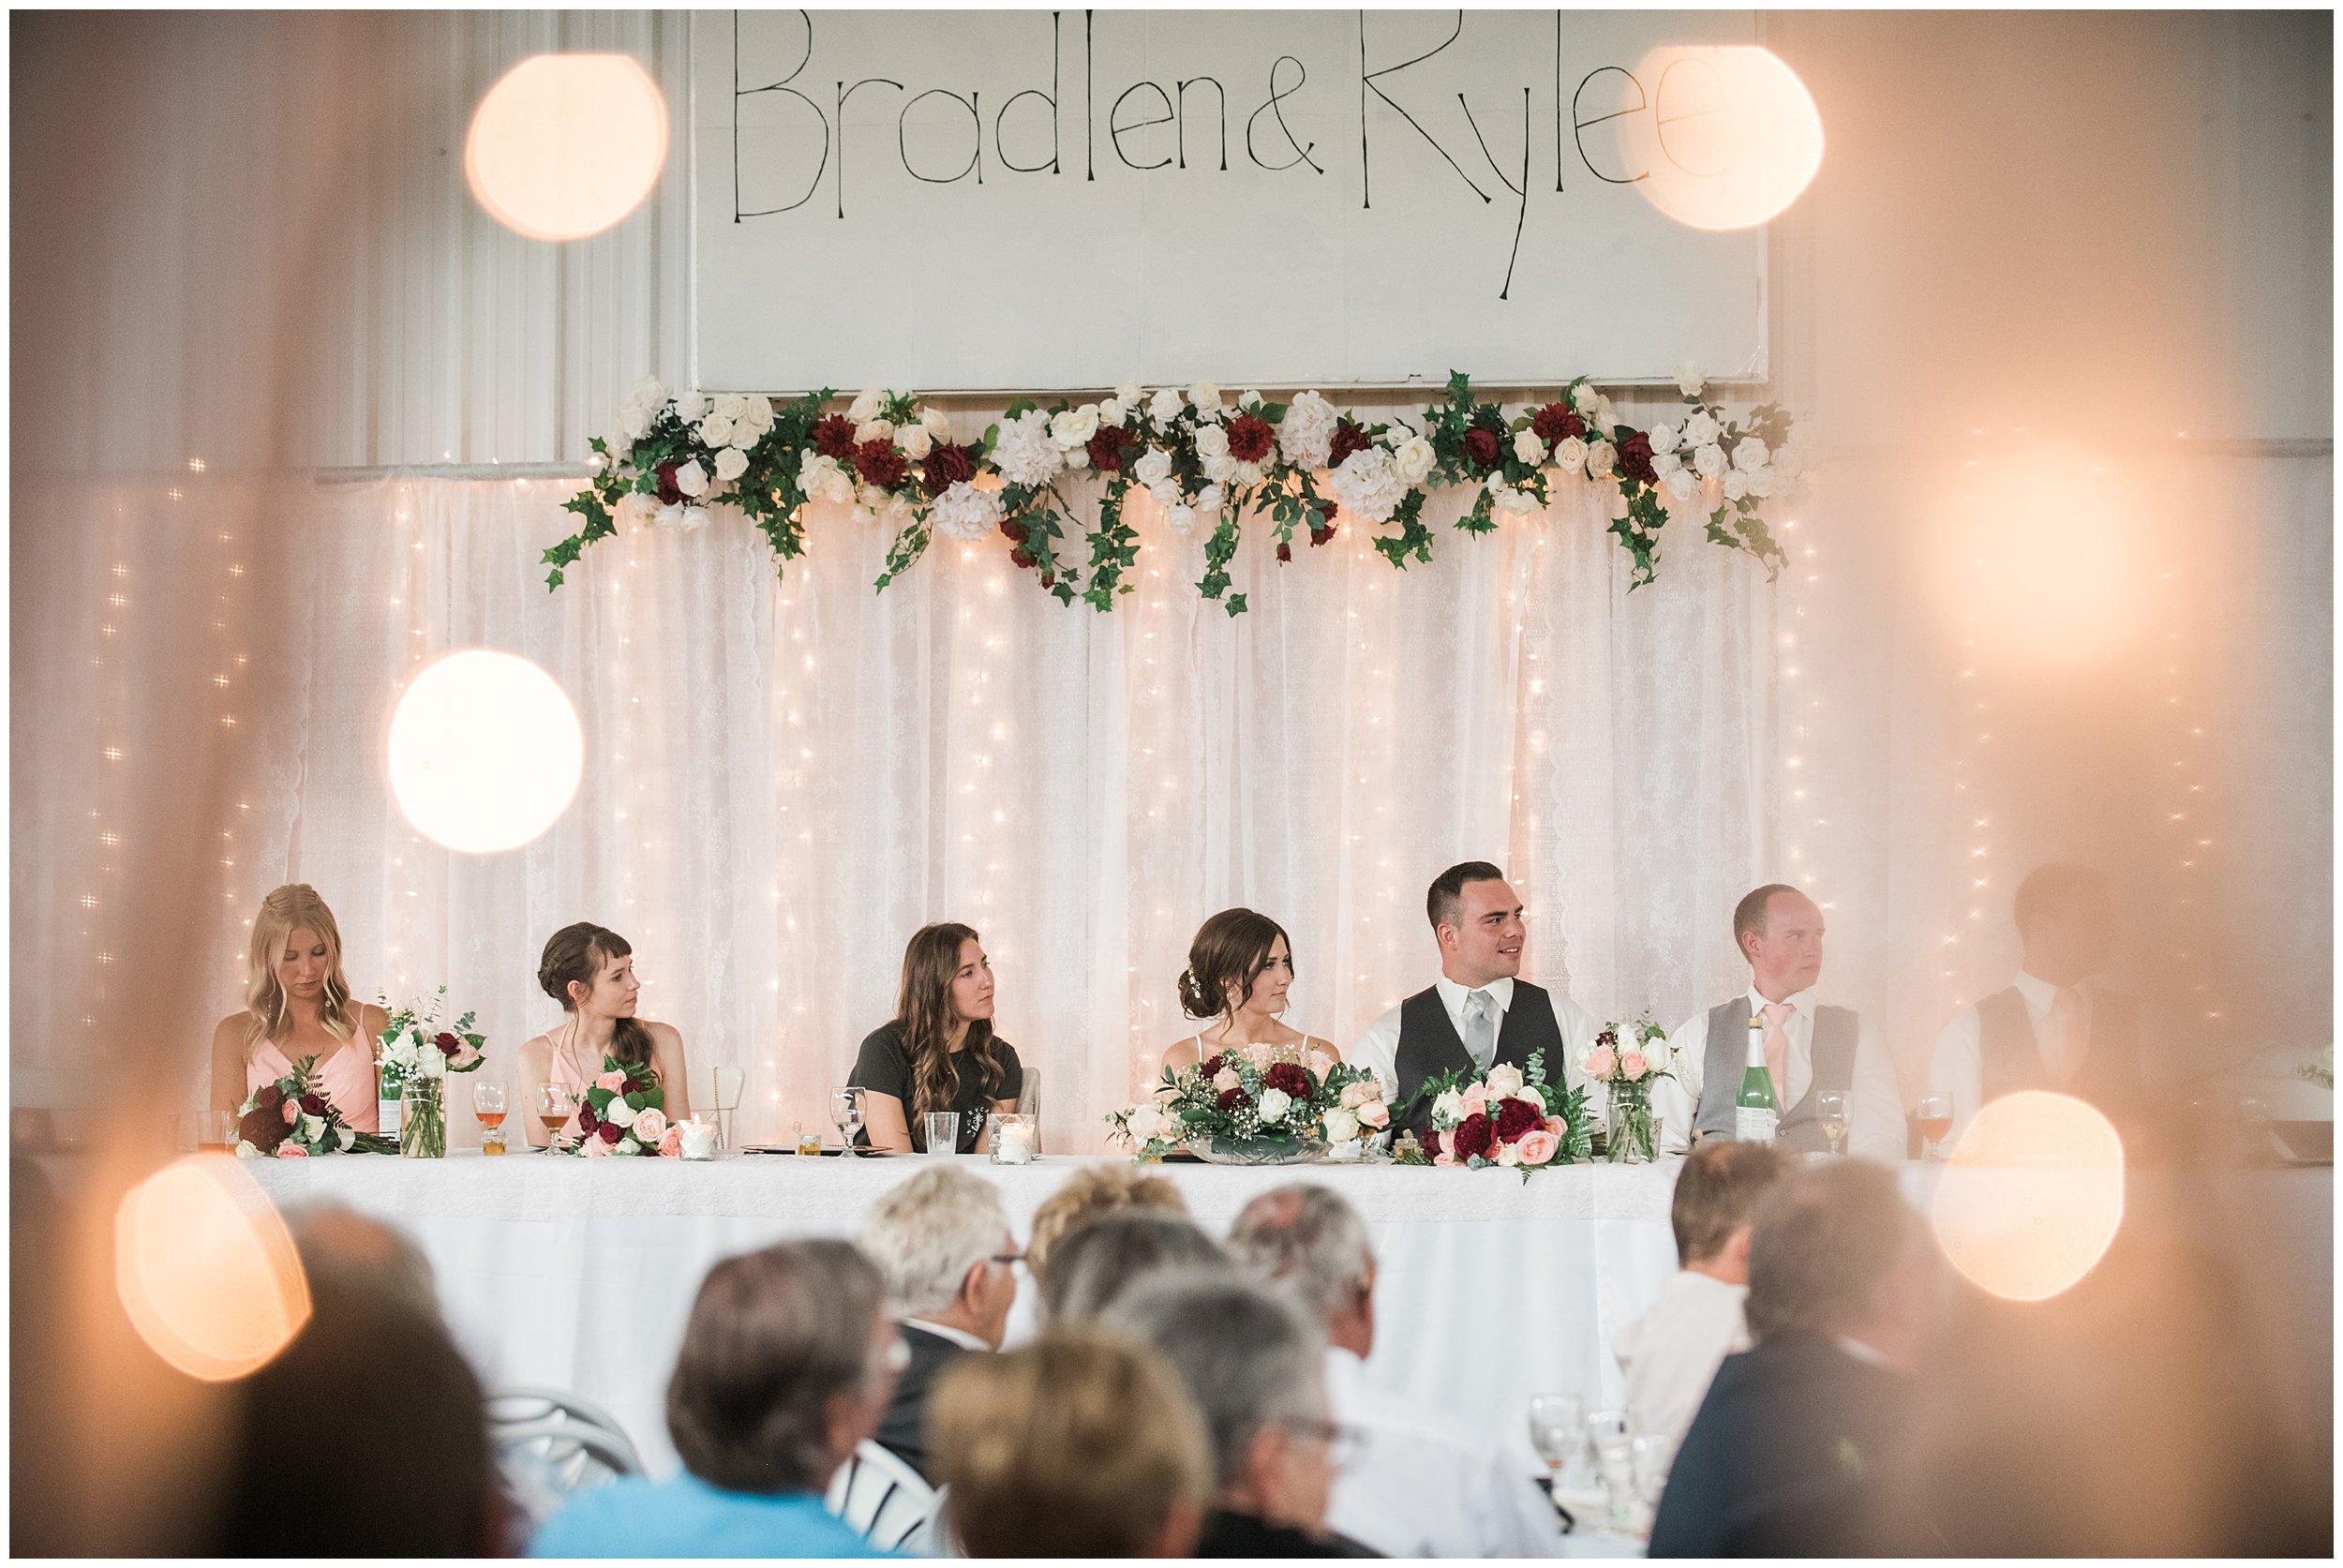 Alyssa-Poland-Photography_0604_alberta wedding.jpg